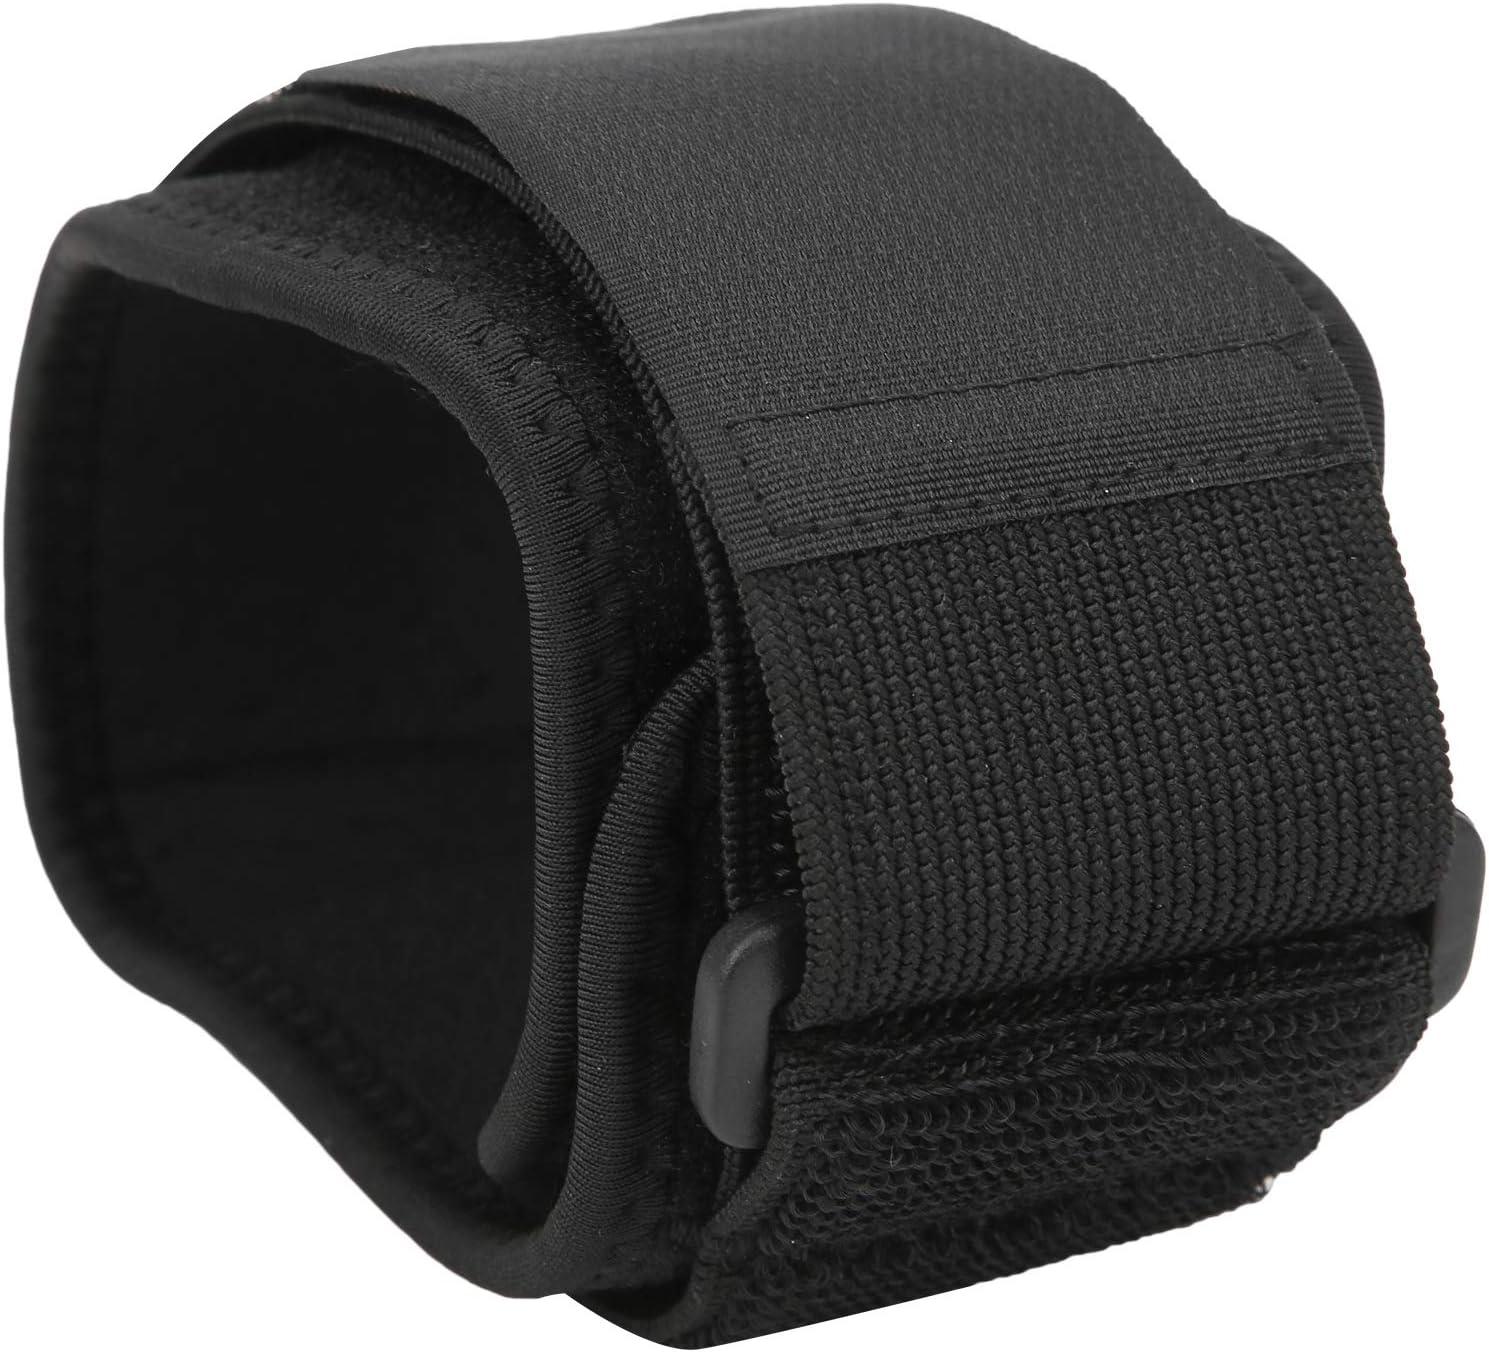 WNSC Elbow Brace Belt Compression Bask [Alternative dealer] 14.2x3.3in Sleeve Cheap SALE Start